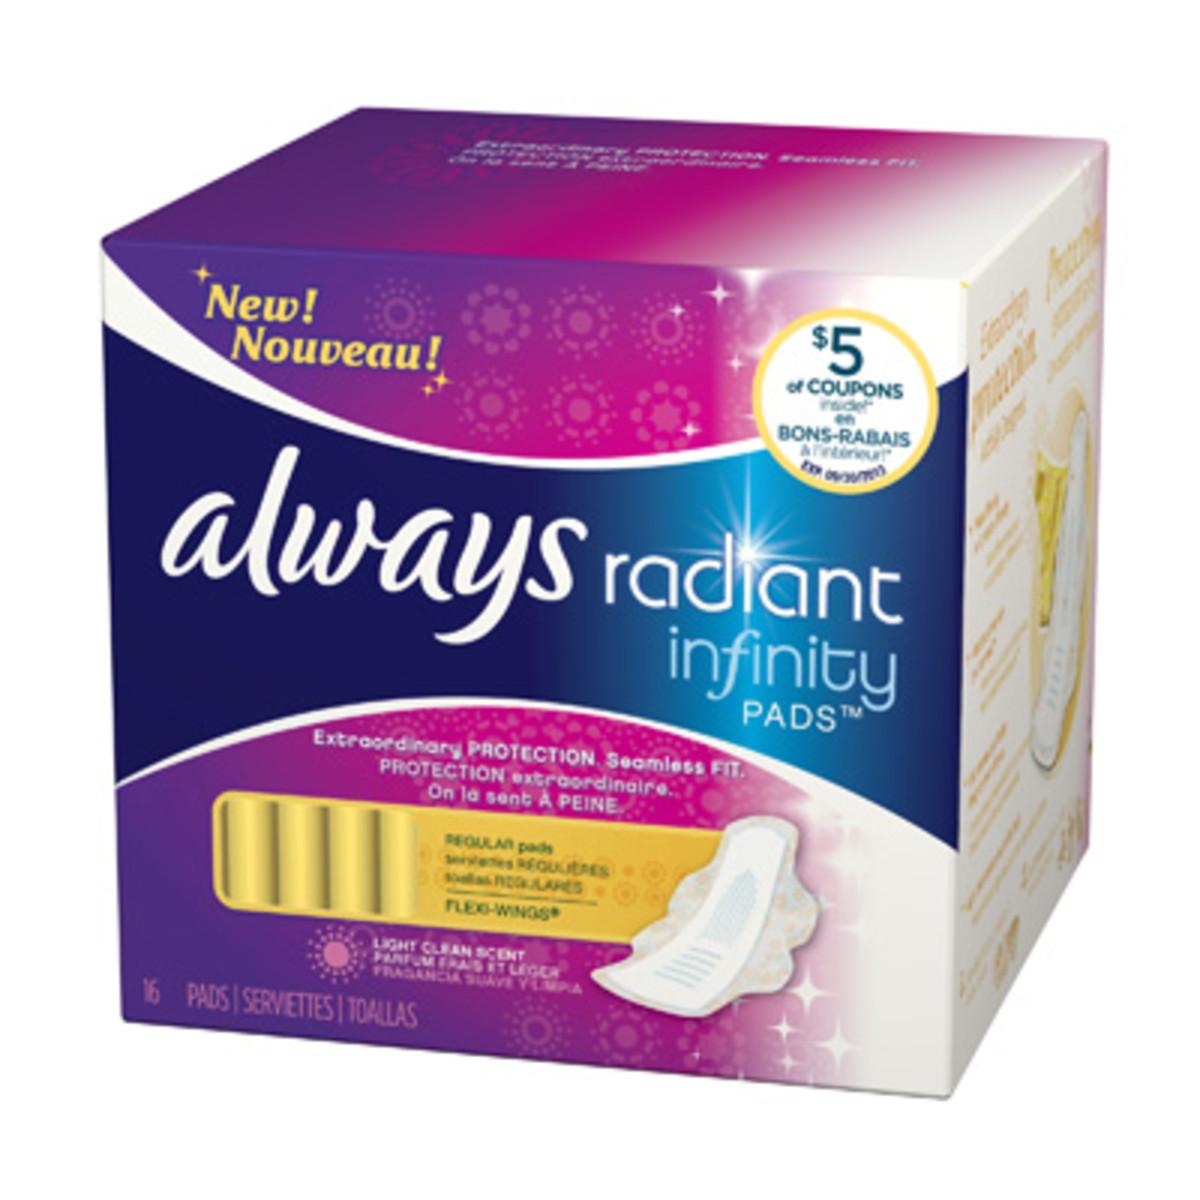 Always Radiant Infinity Pads